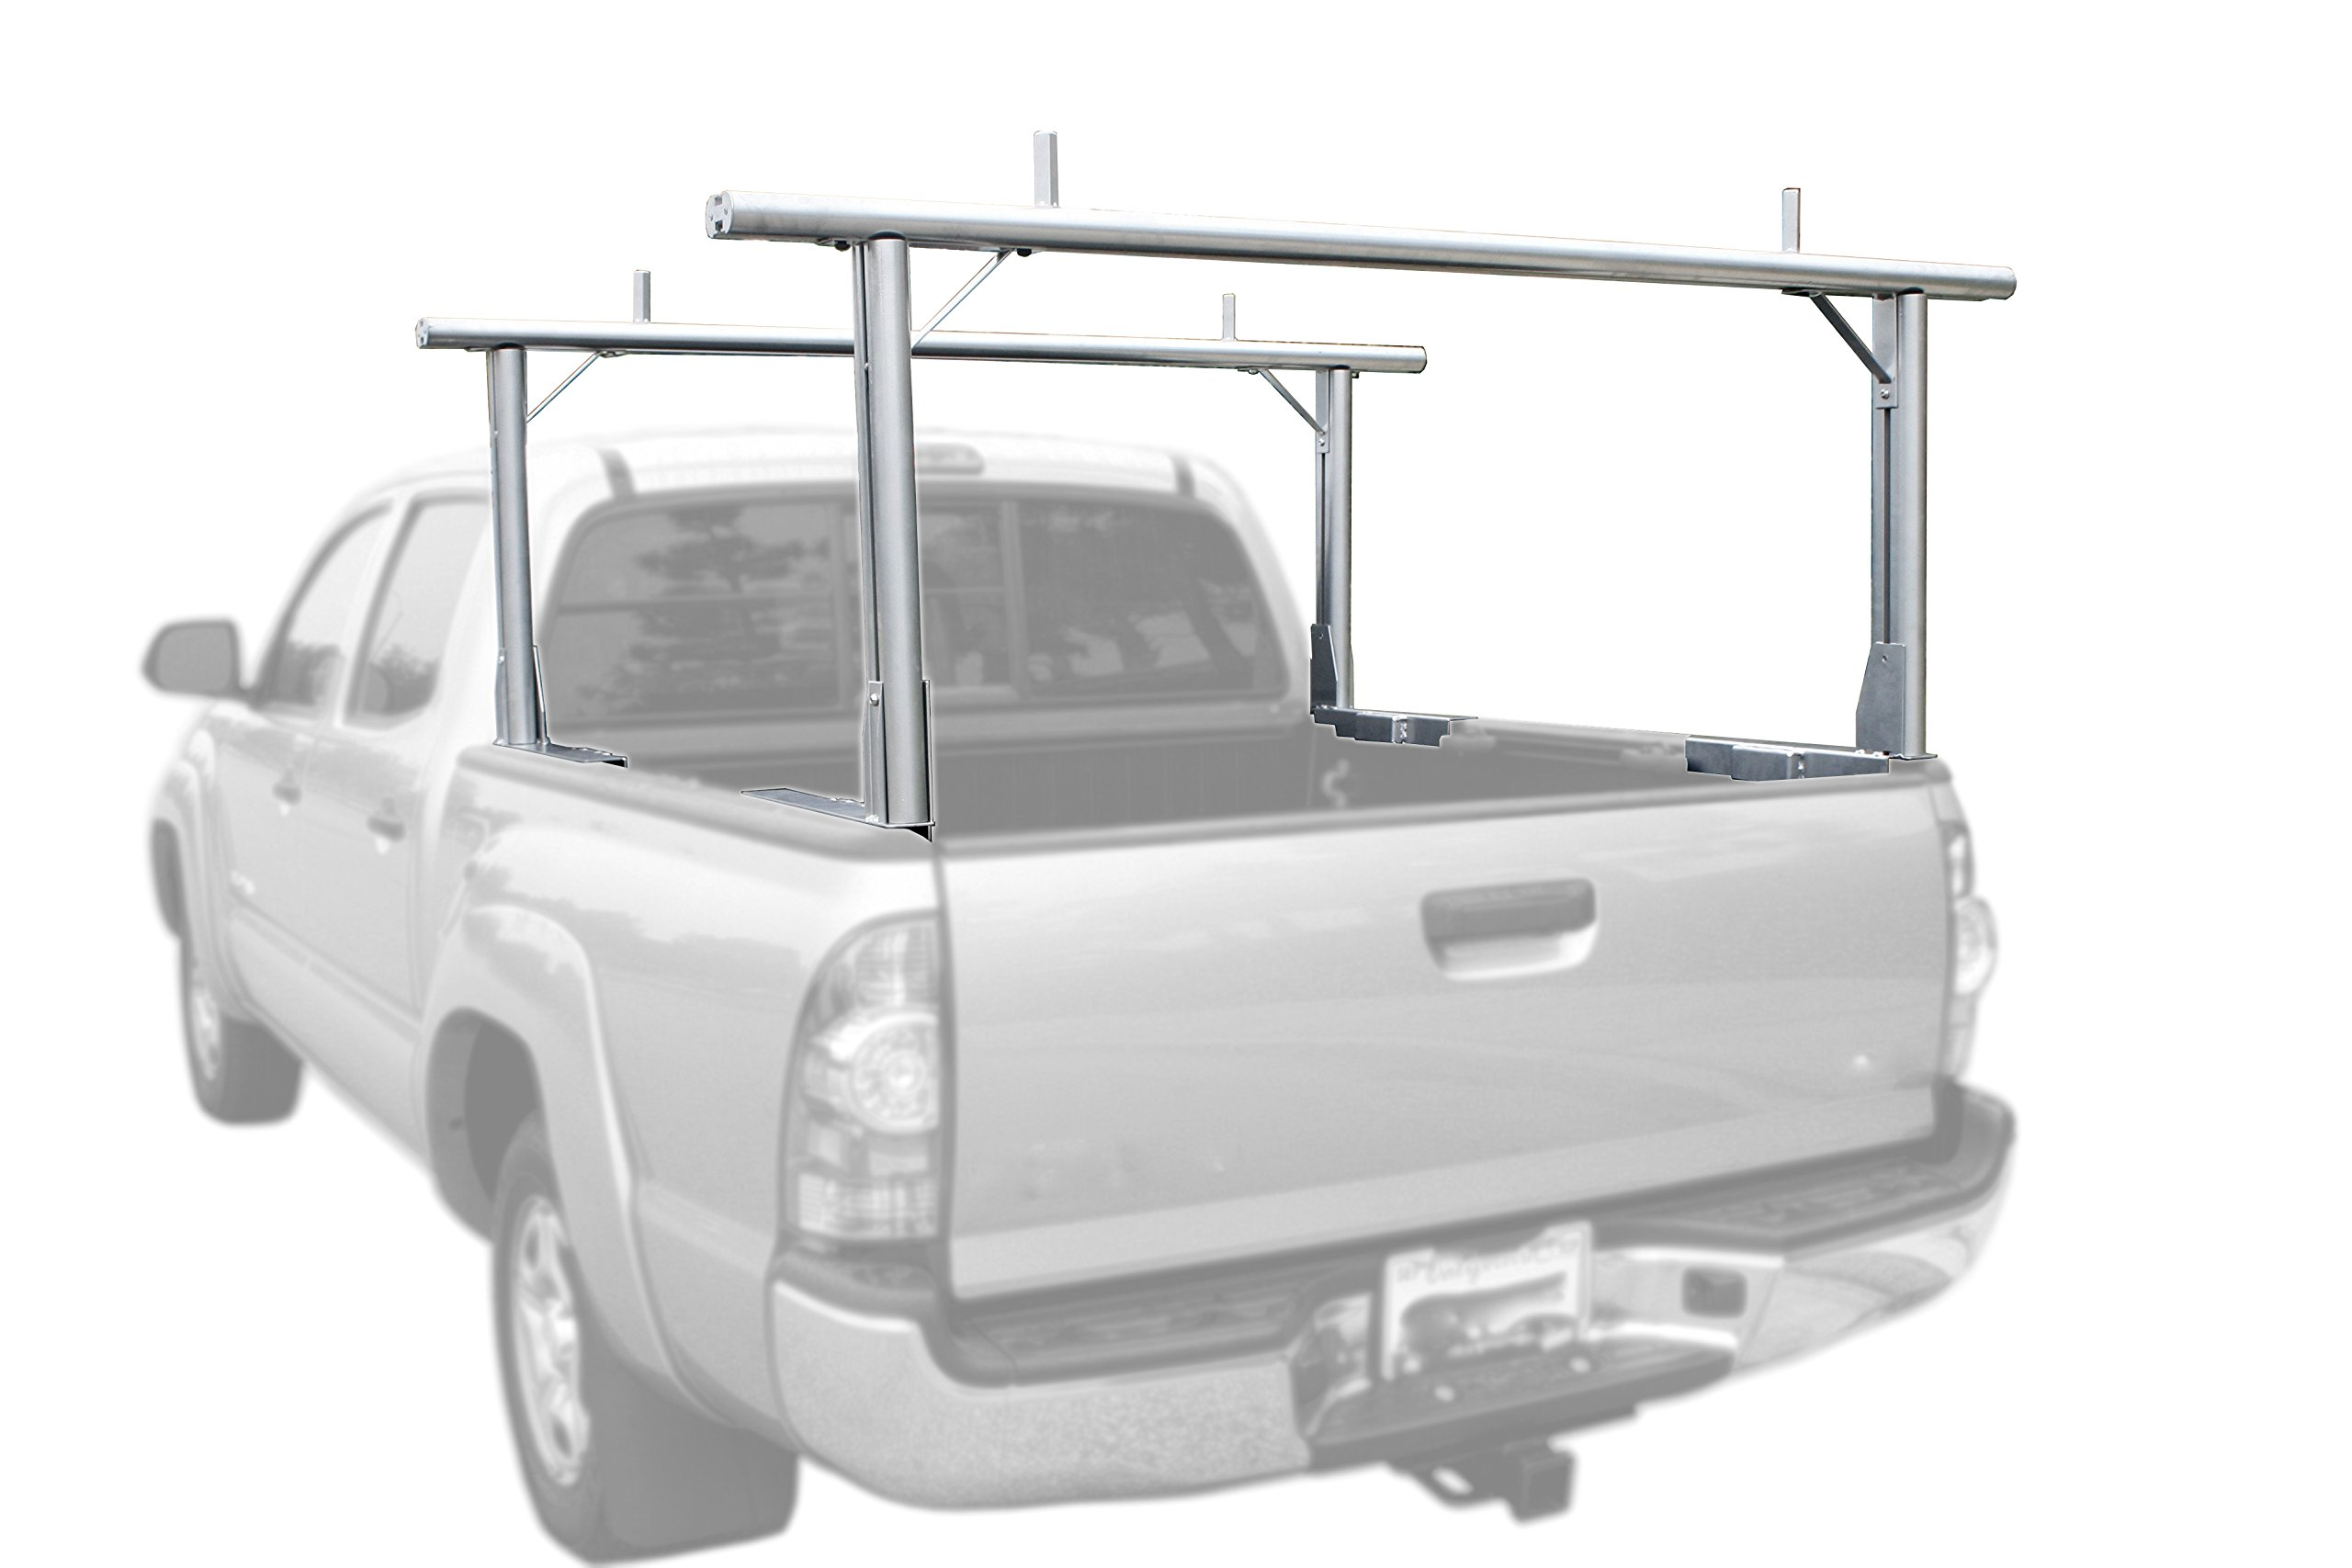 bed pick img up roof racks rack truck